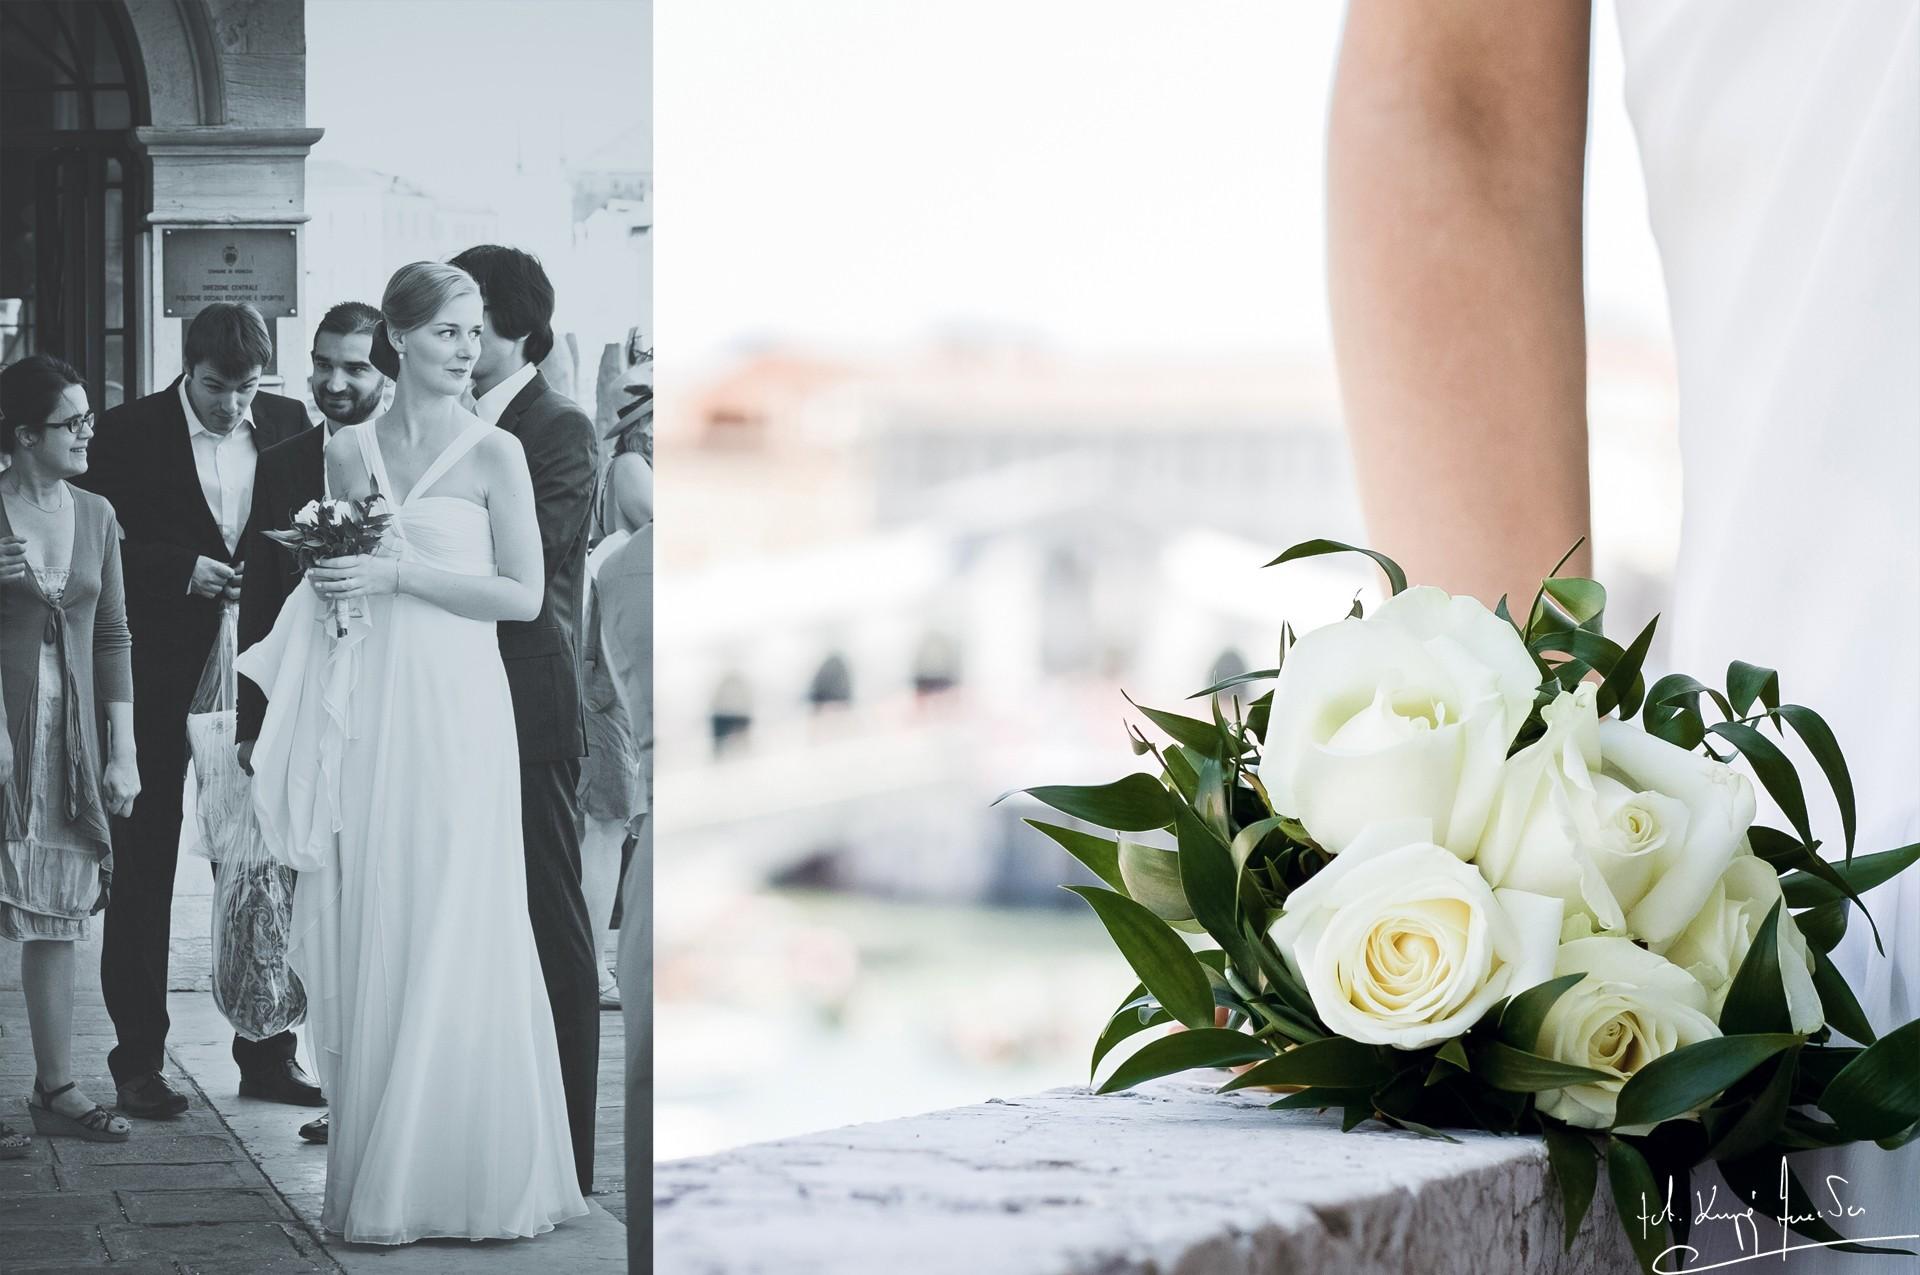 Ślub w wenecji 22 Manuela Luiza & Young Seon Song